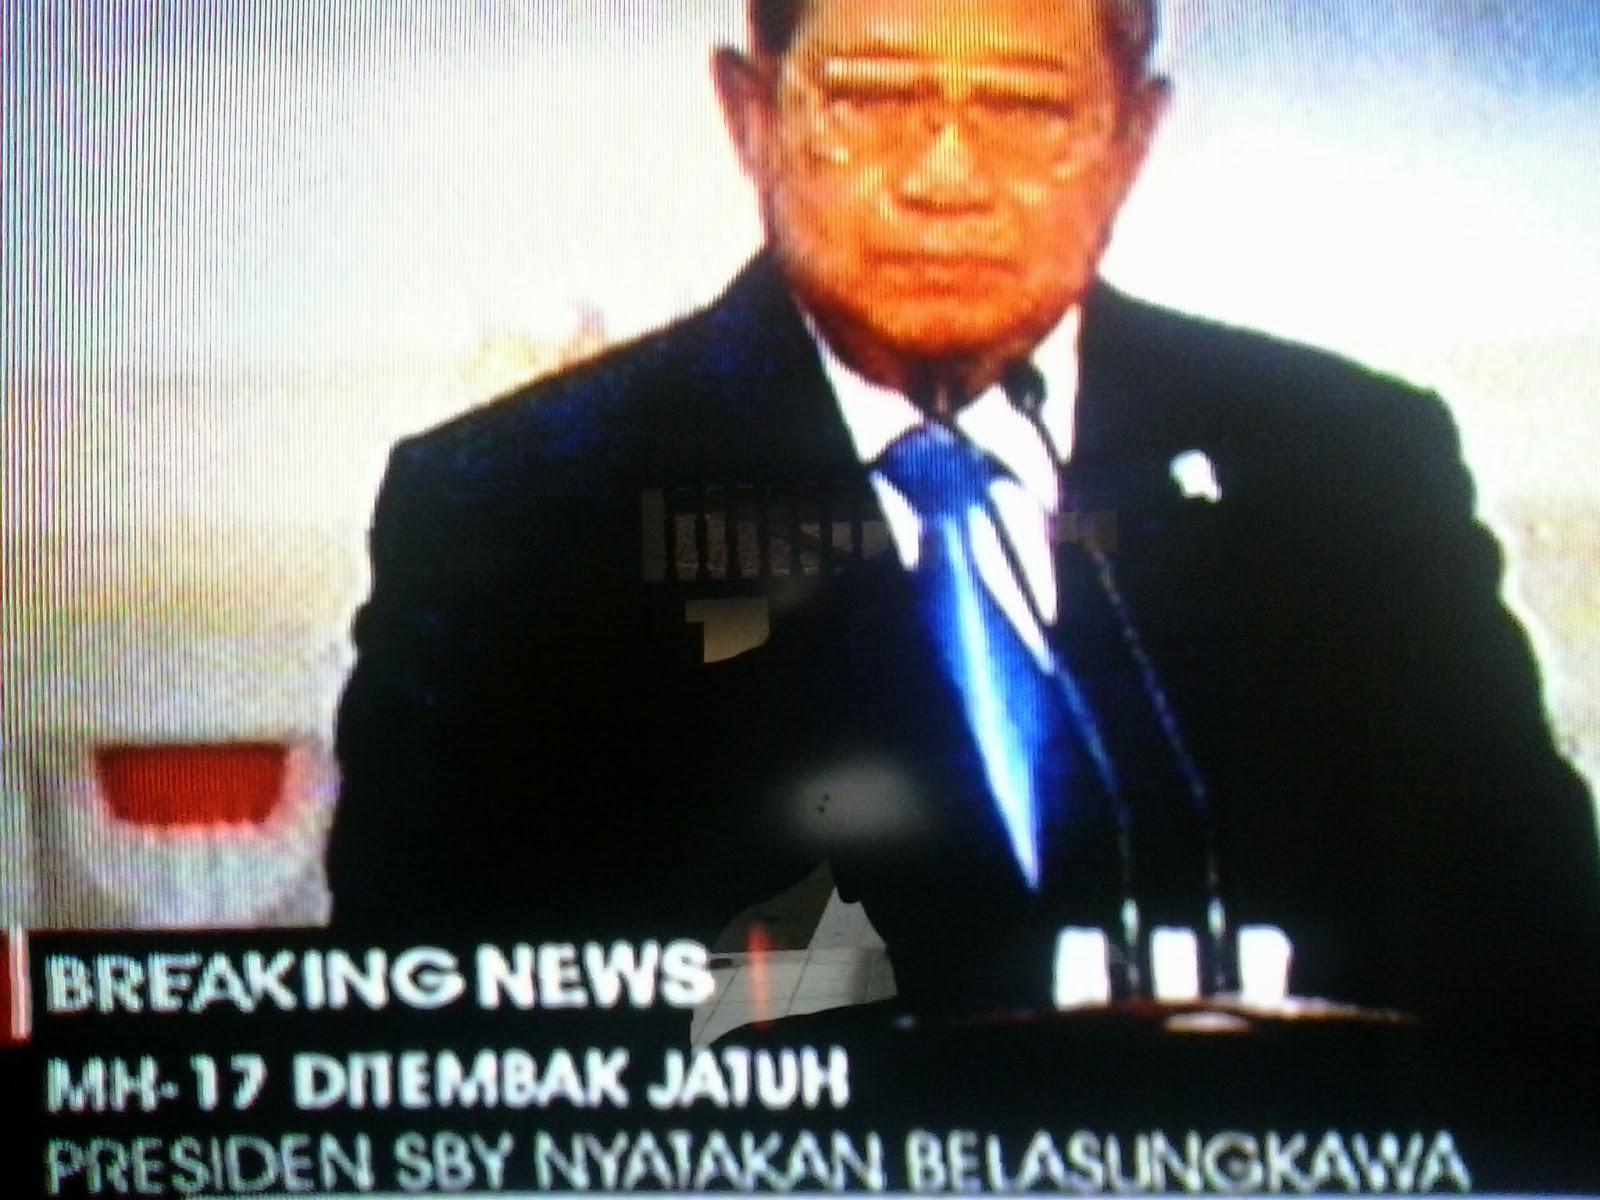 Susilo Bambang Yudhoyono, mengungkapkan rasa bela sungkawanya